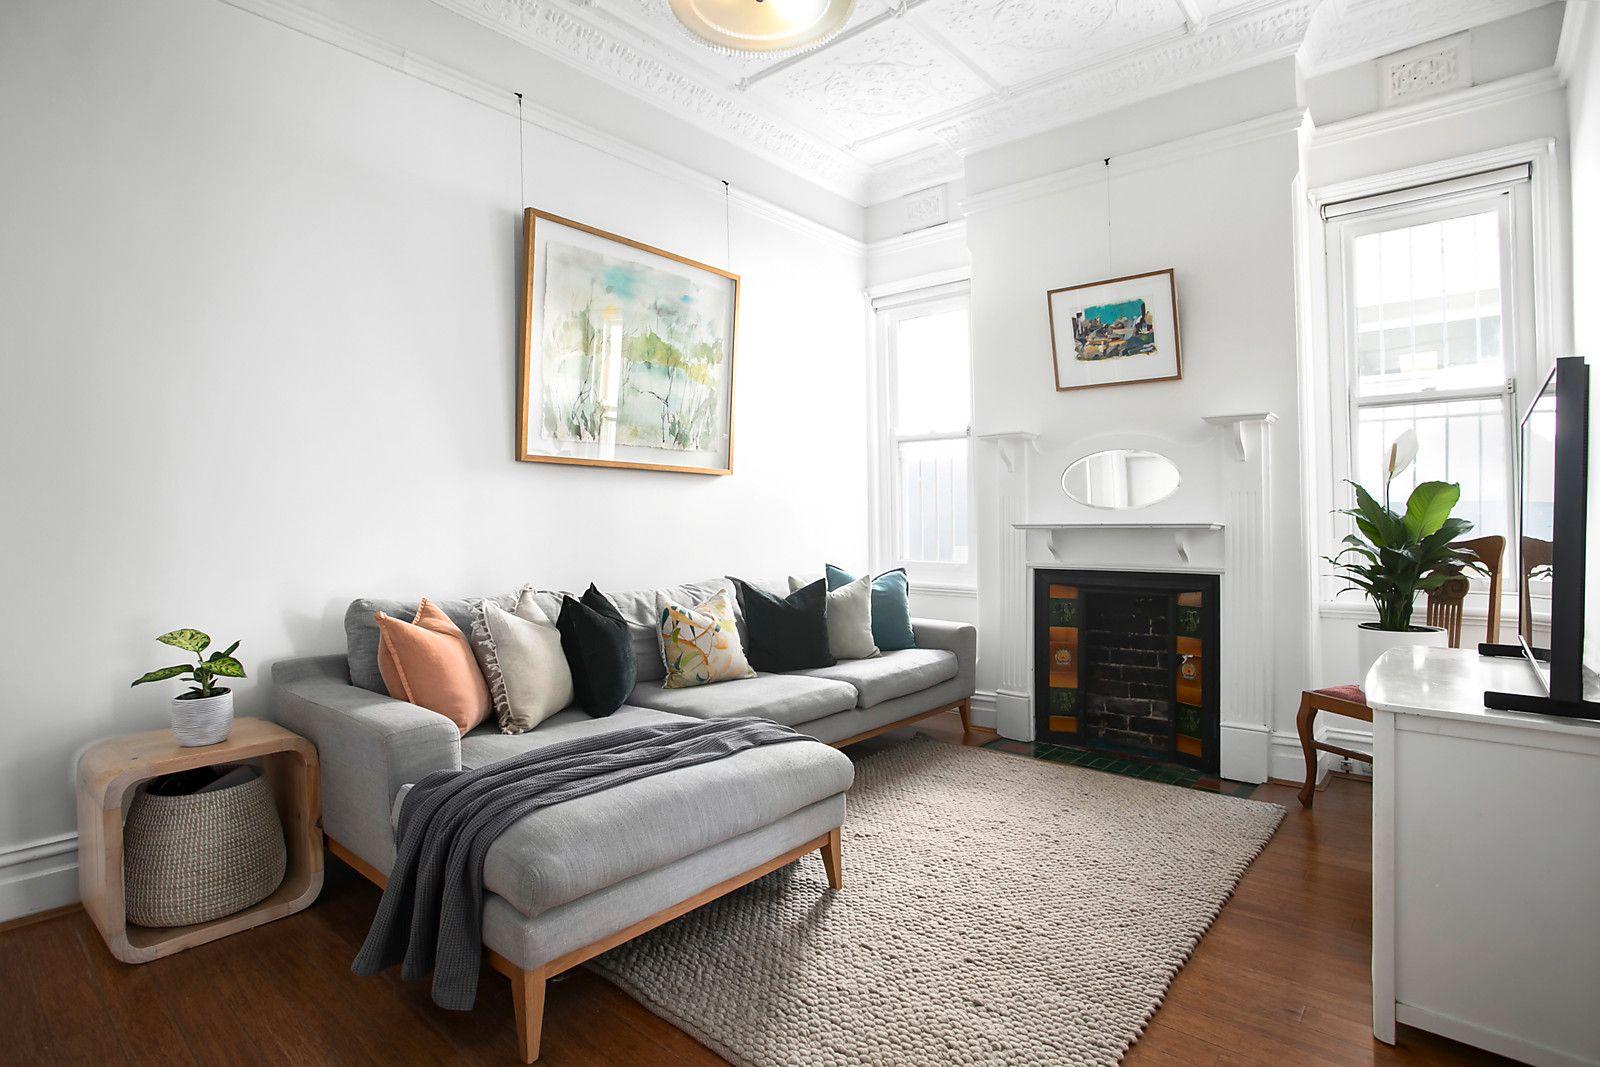 4 bedrooms House in 48 Kensington Road KENSINGTON NSW, 2033